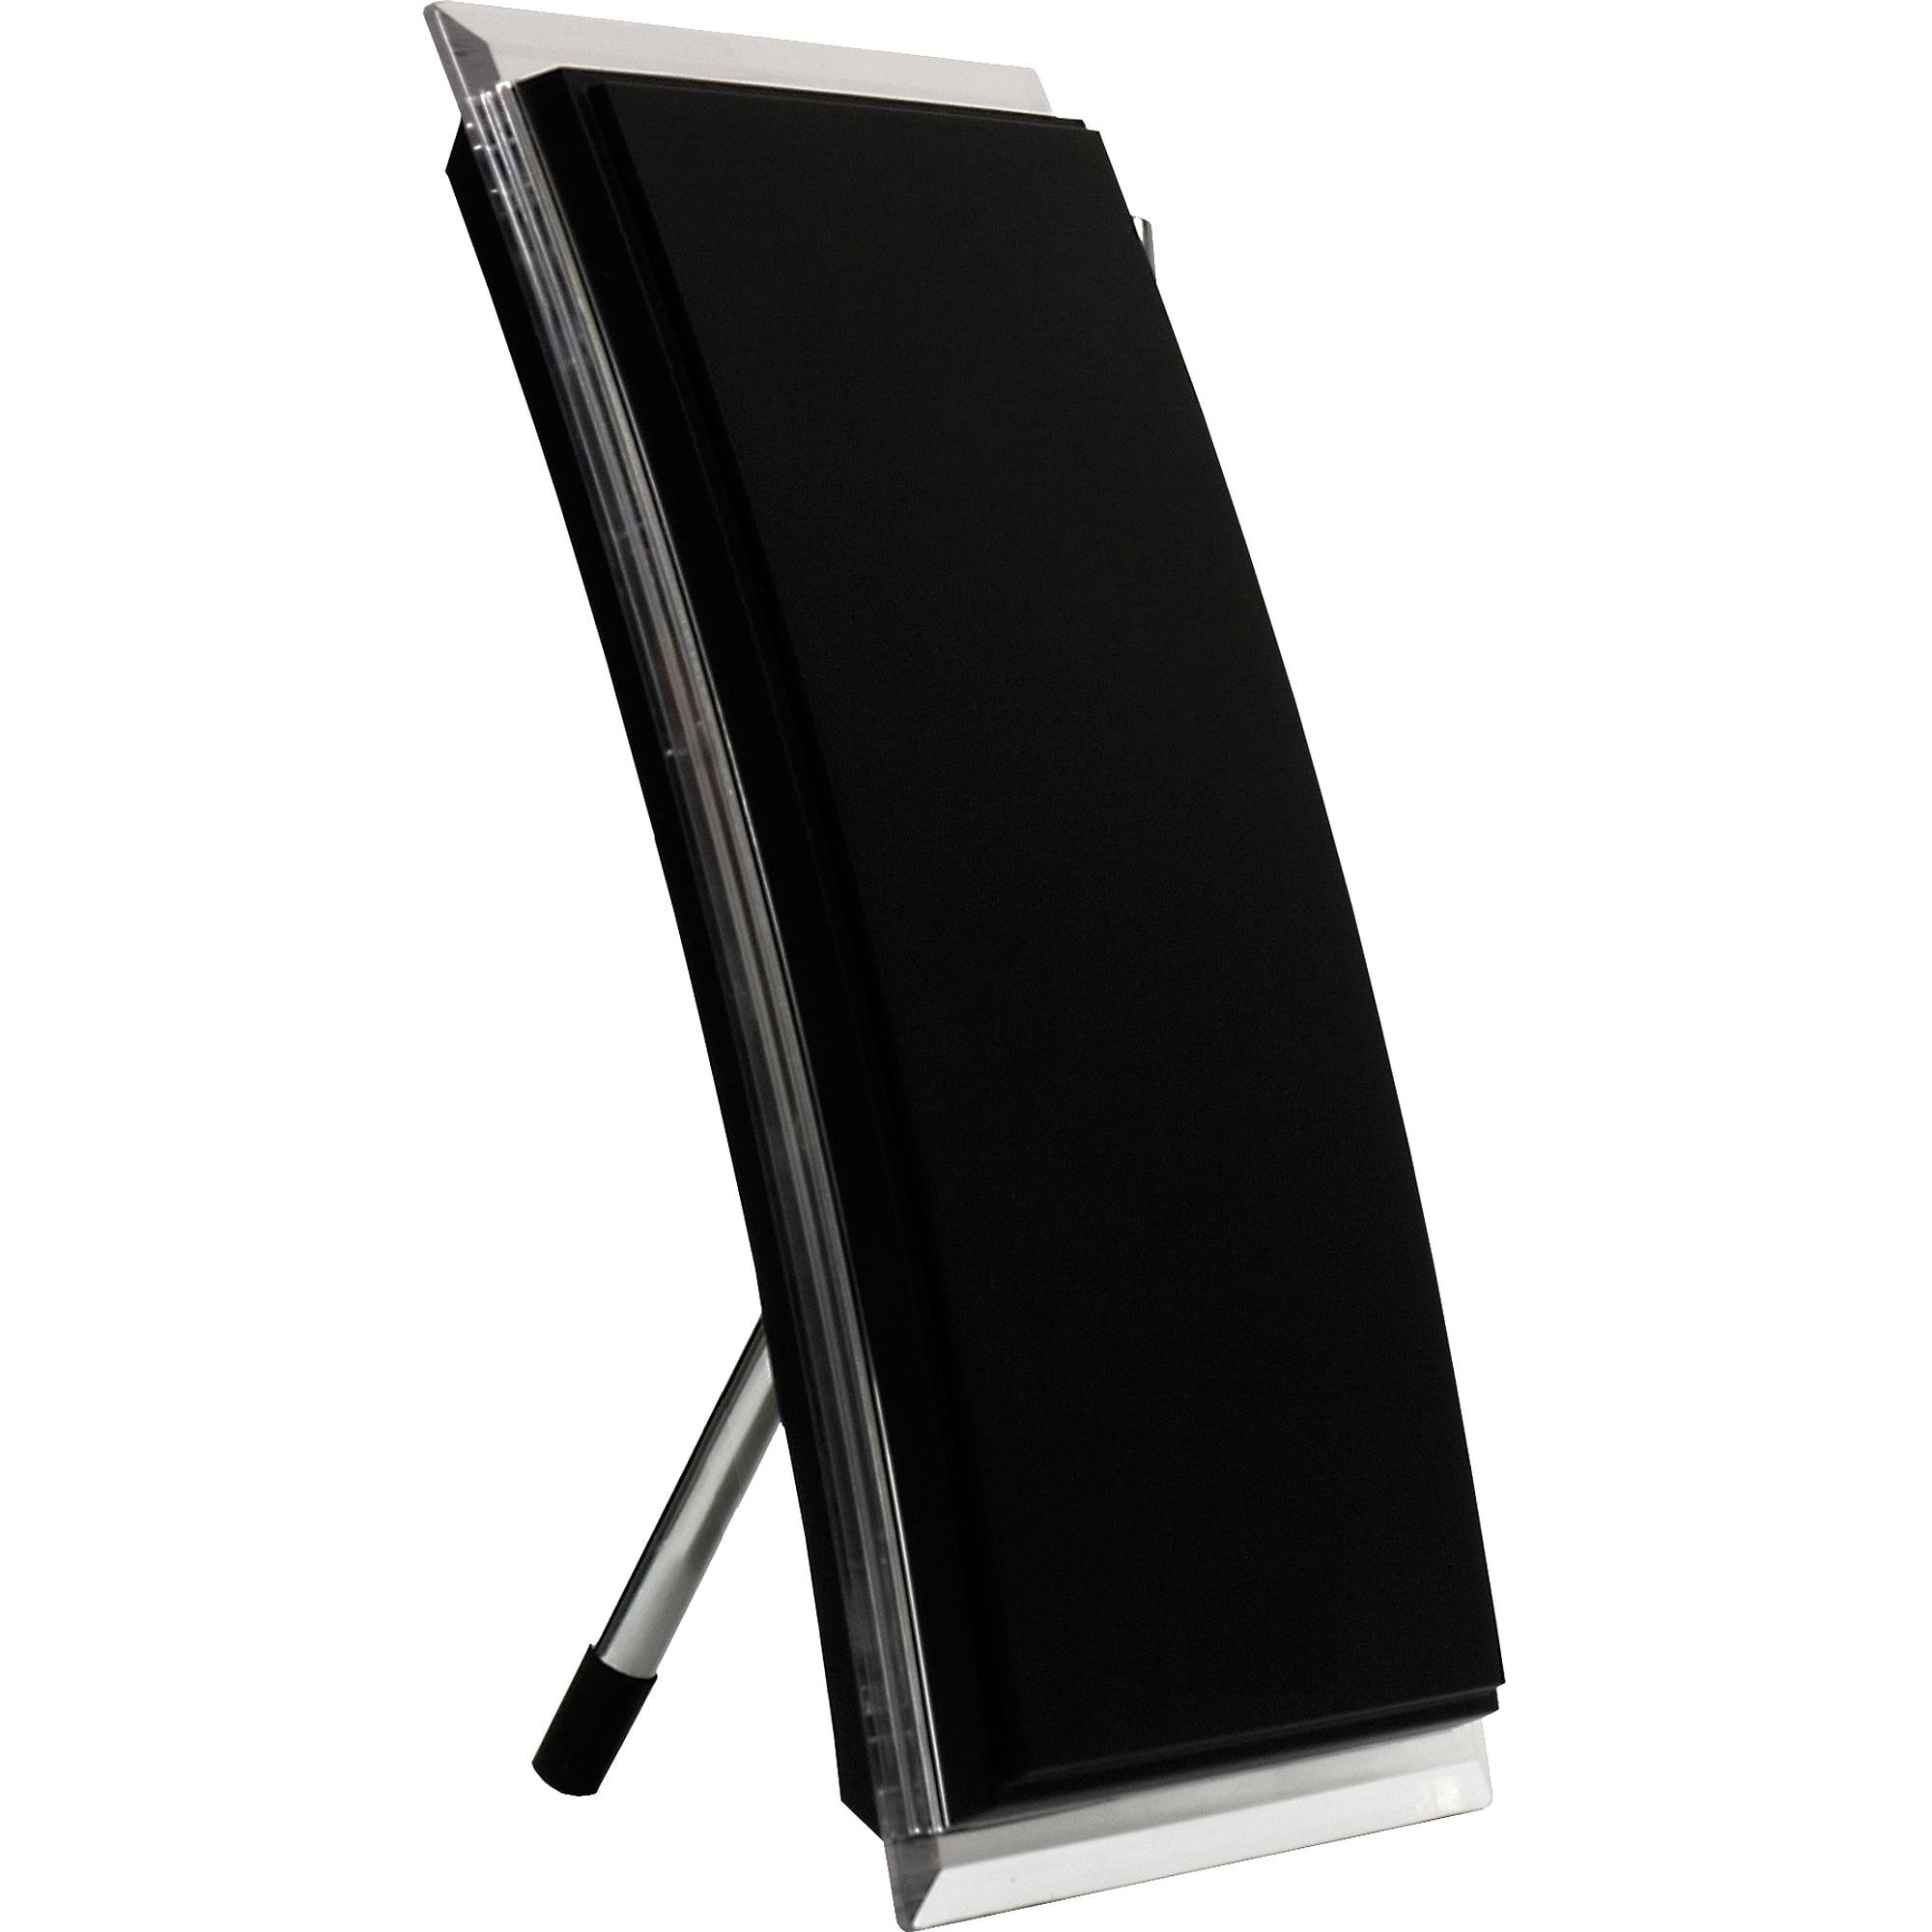 Ge Flat Panel Amplified Antenna Walmartcom